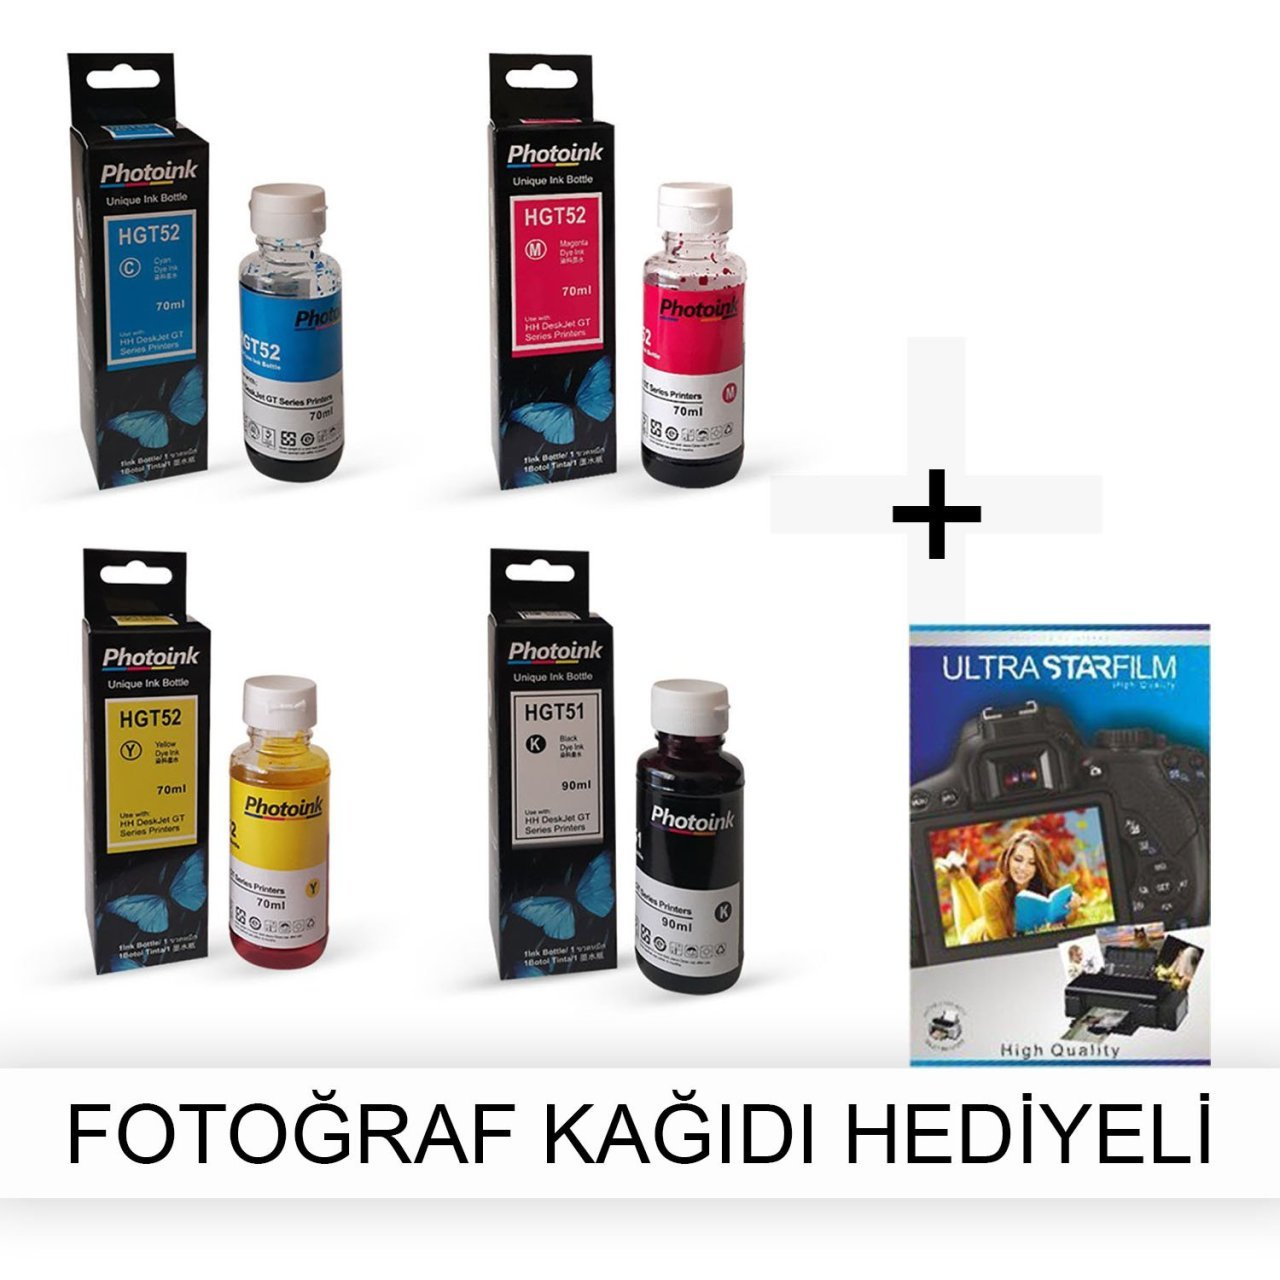 HP Officejet 7115 1 traje de tinta fotográfica-regalo de papel fotográfico